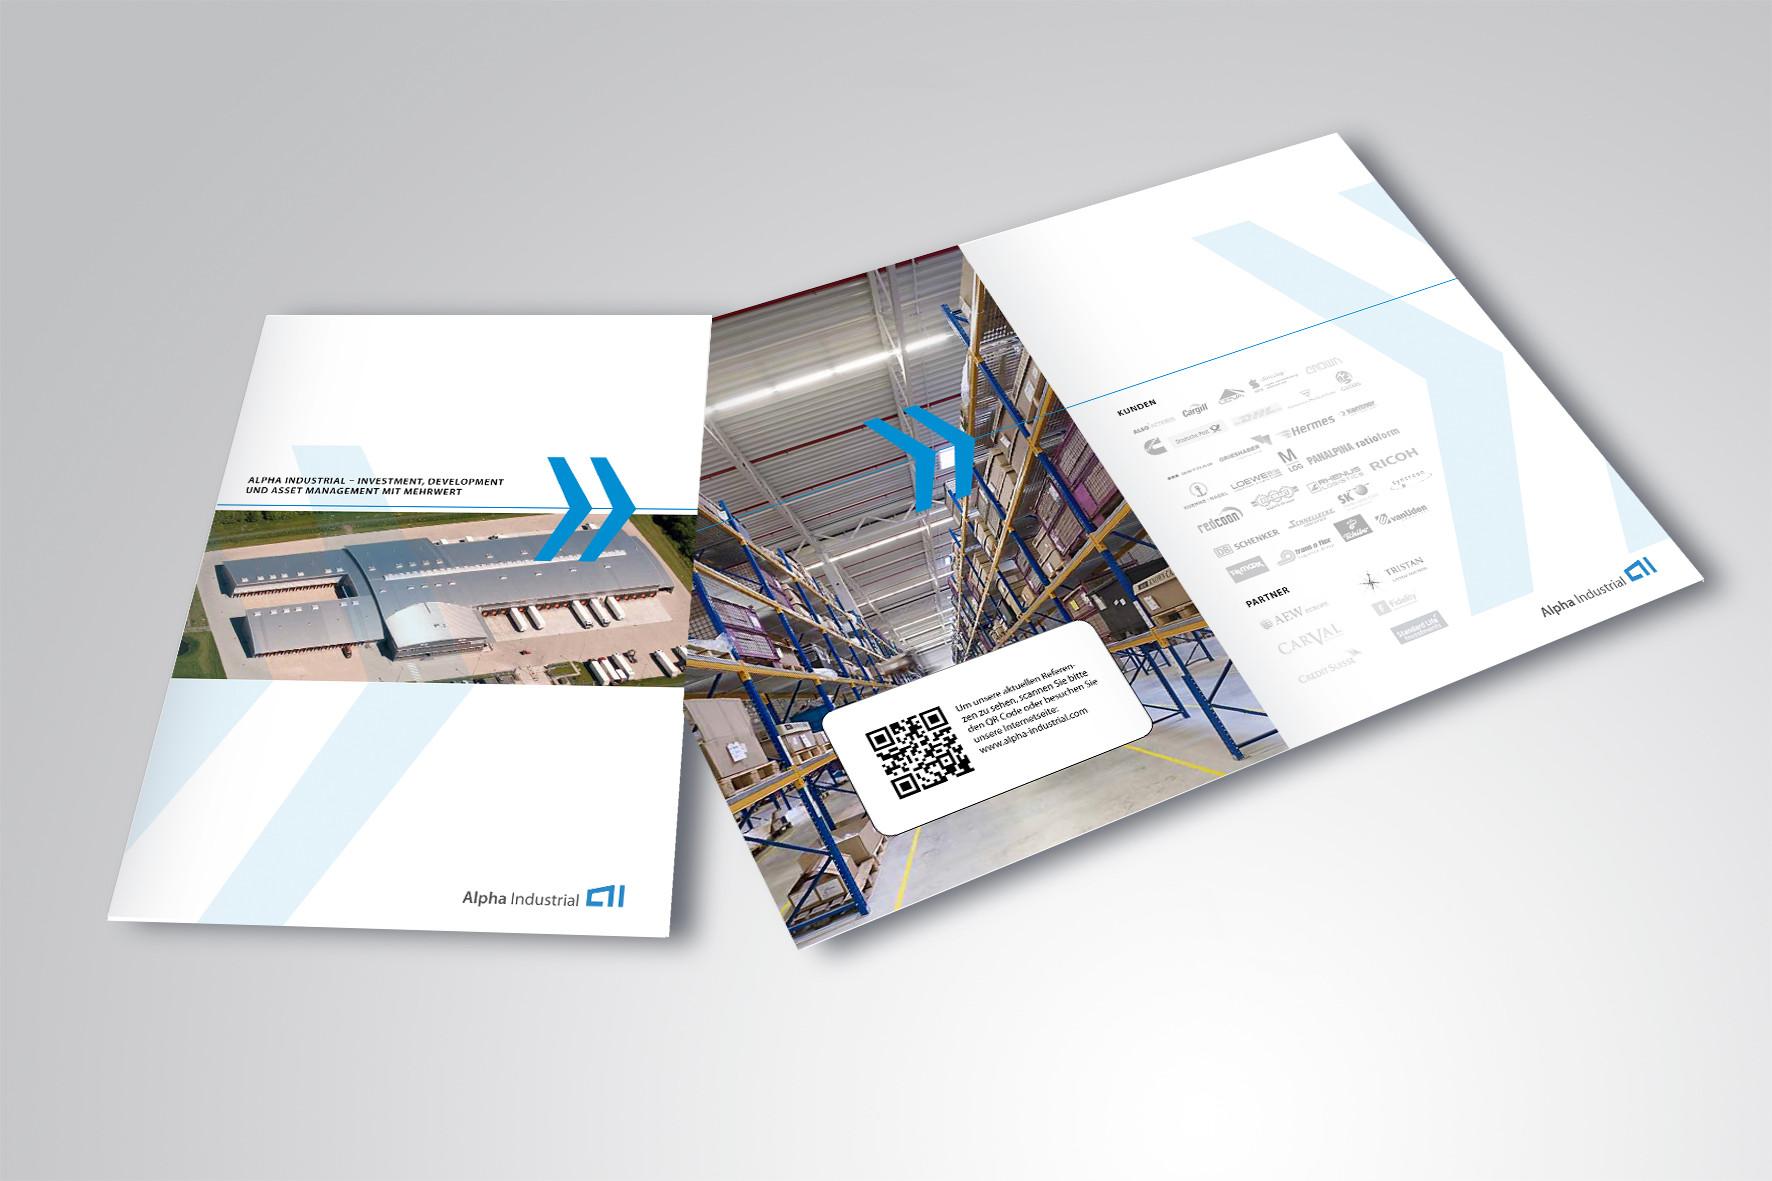 Kunde: Alpha Industrial · Produkt: Imagebroschüre